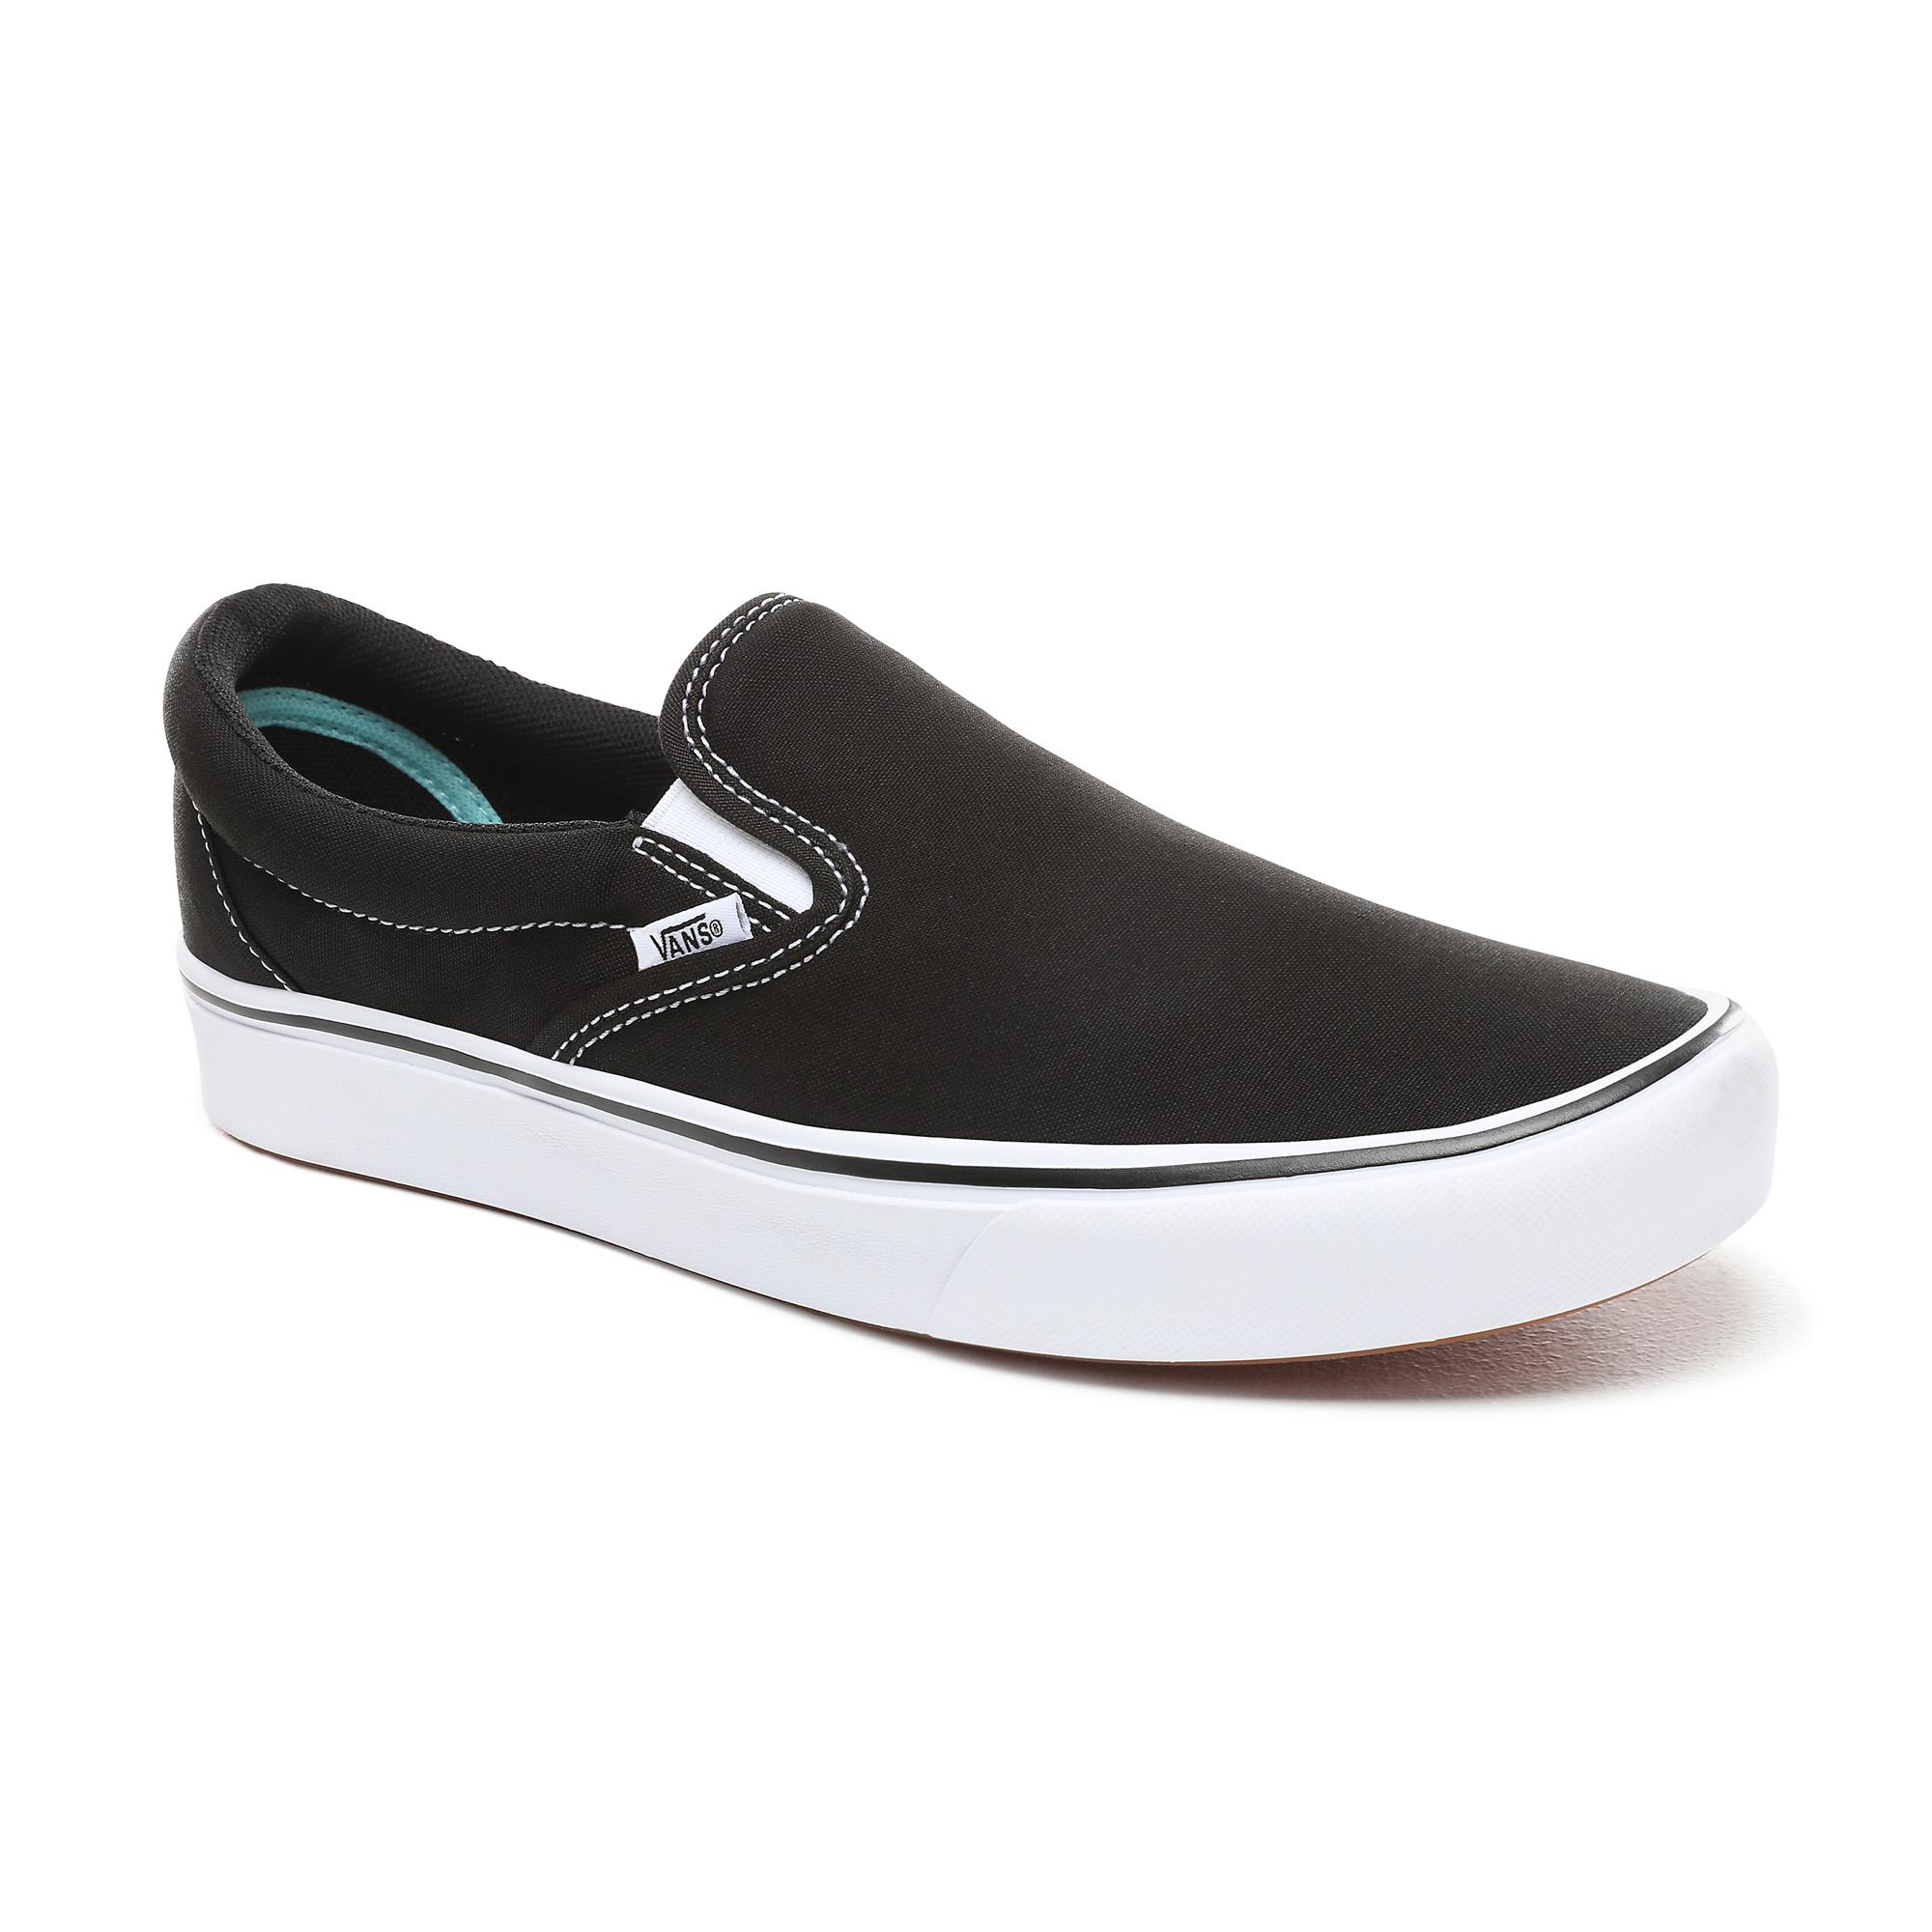 Vans Classic ComfyCush Slip-On sneakers